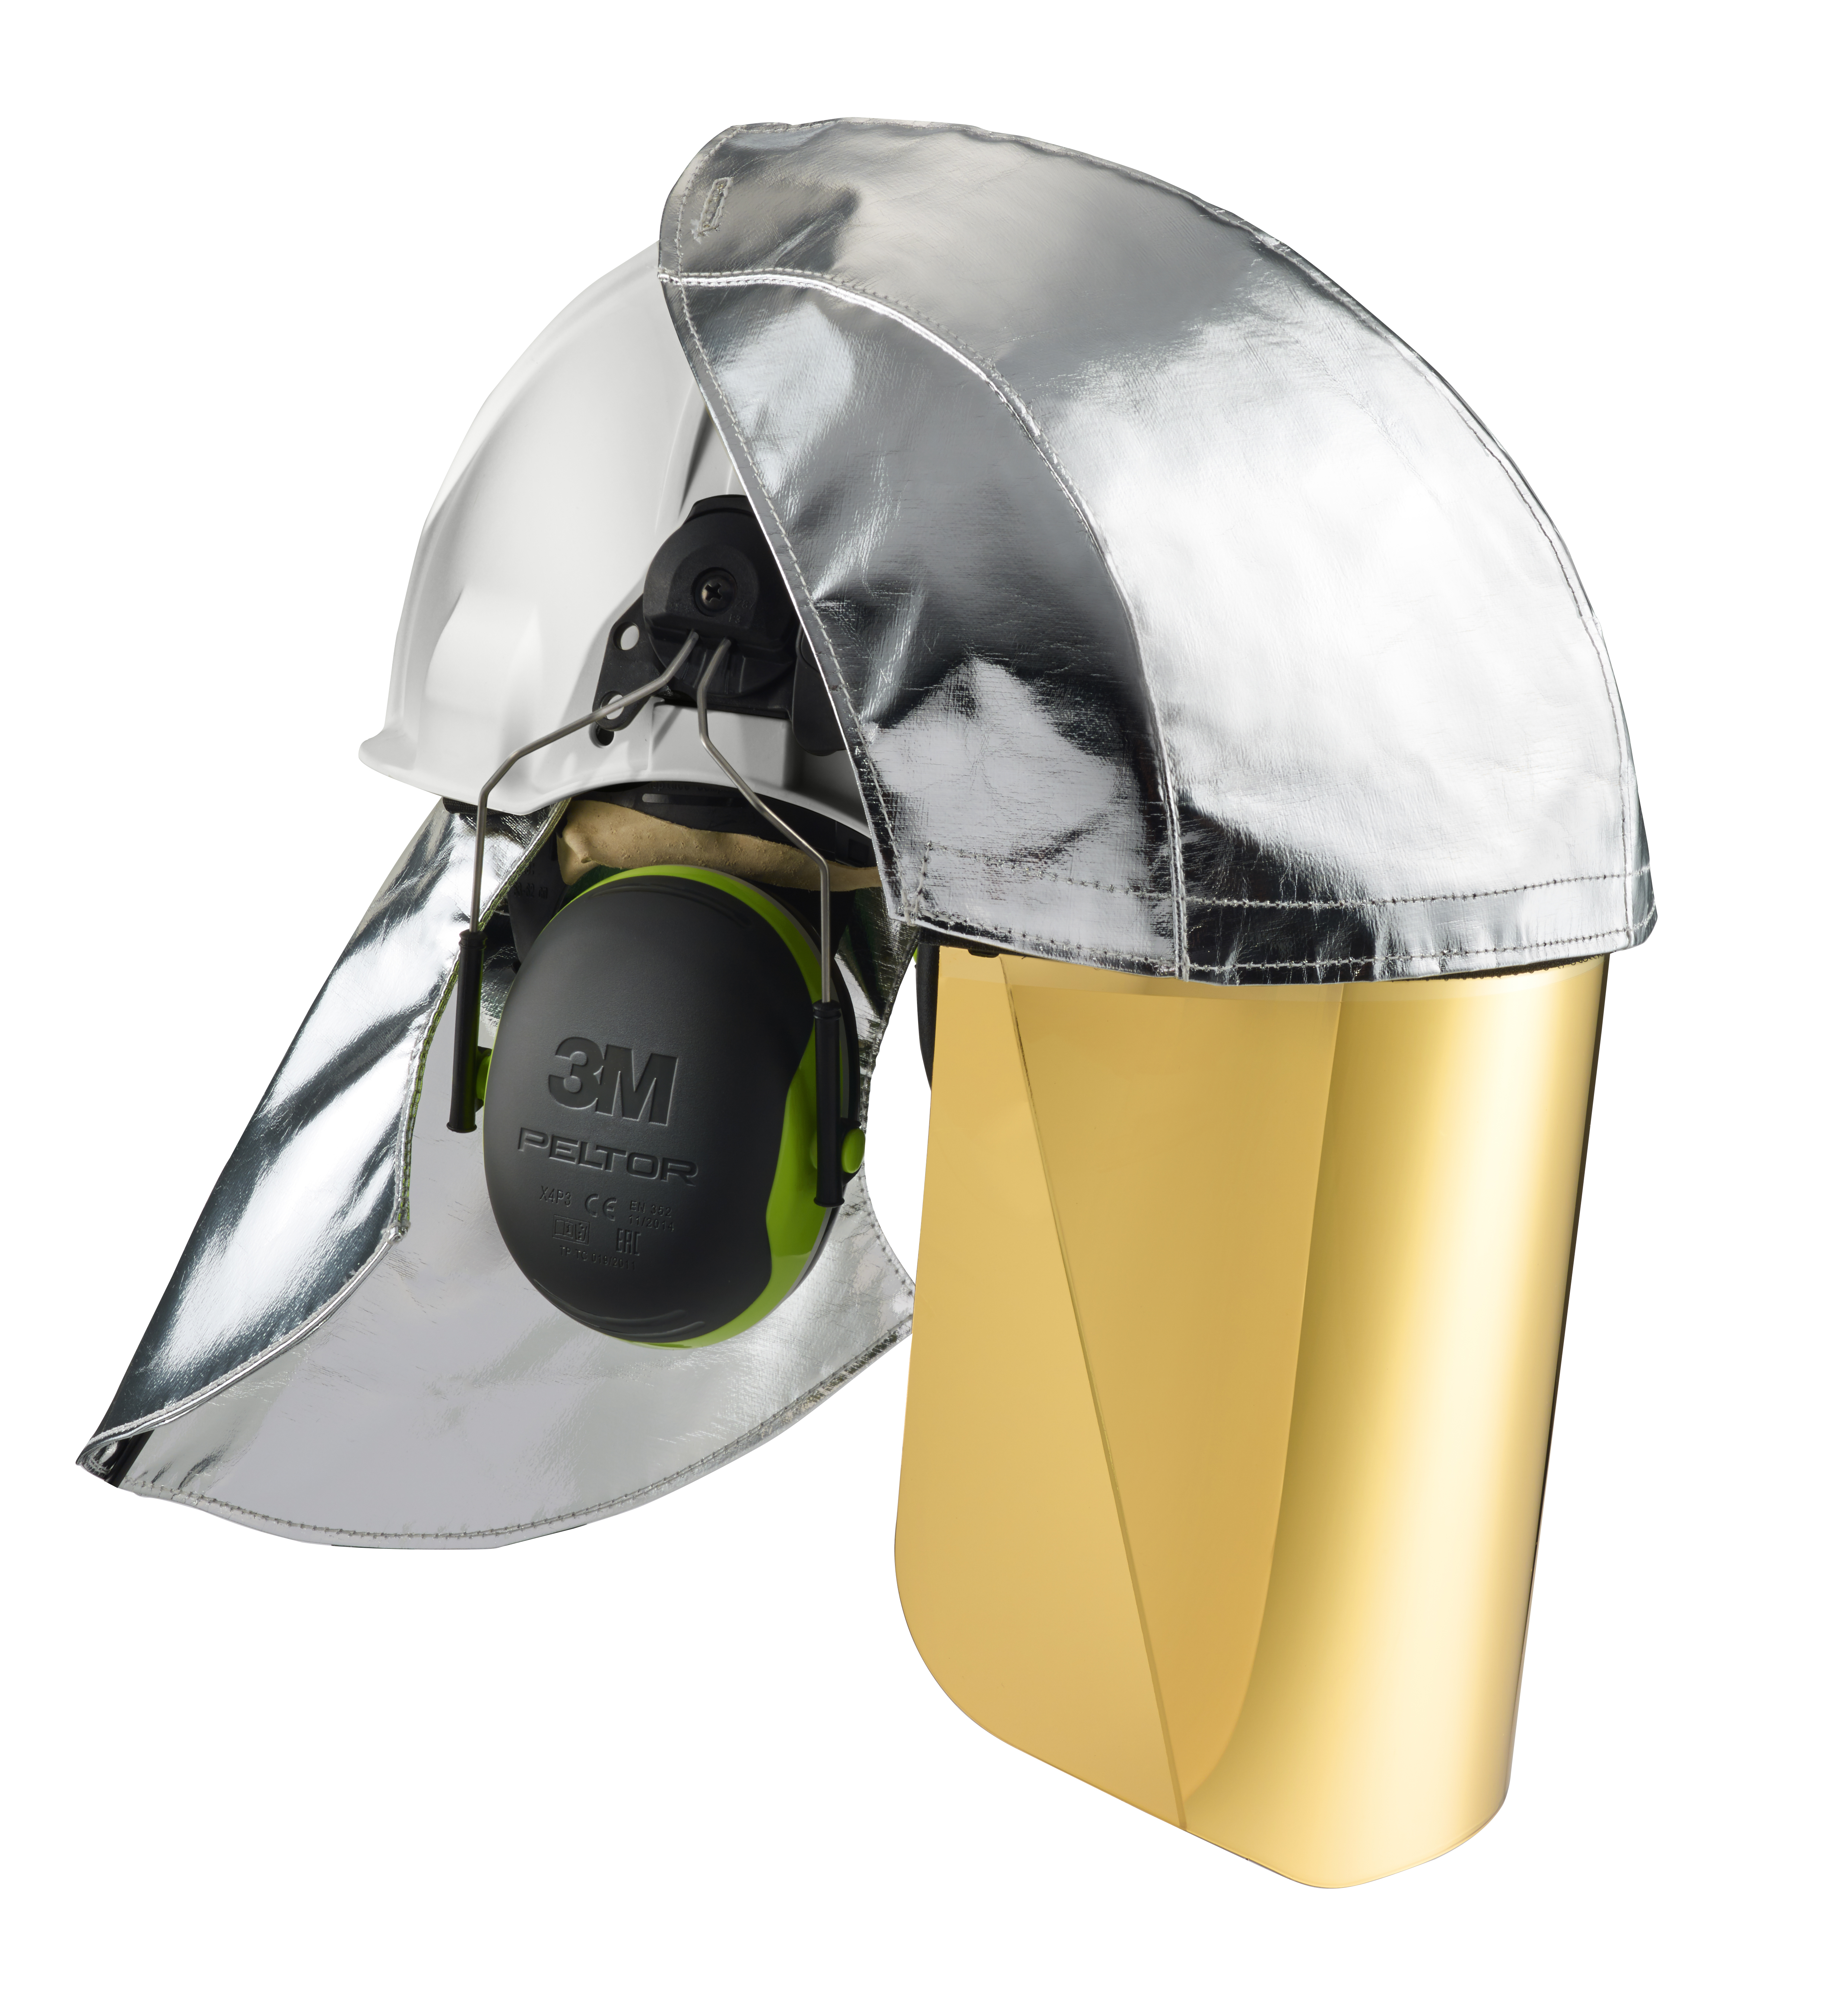 3m_g3501_kombination_weiß_5xg-ir5_visier_gold_toenung5_aluminium_frontschutz_und_nackenschutz_x4_gehoerschutz